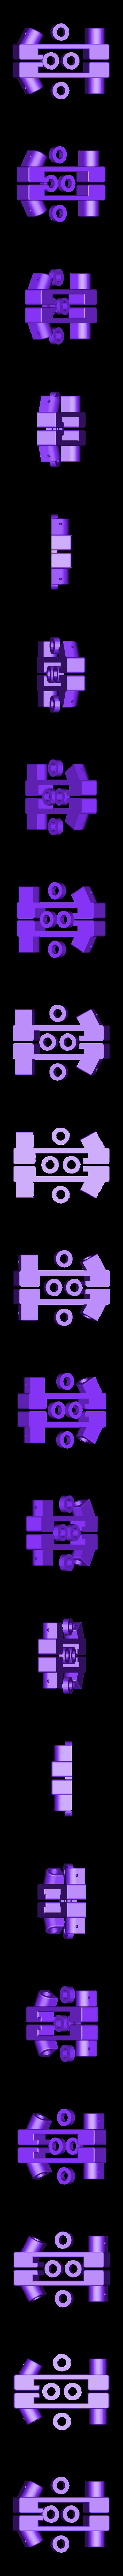 SPOOL_BRACKET_BASE_V1.stl Download free STL file  Thing-O-Matic Filament Spool Bracket • 3D printable object, WorksBySolo